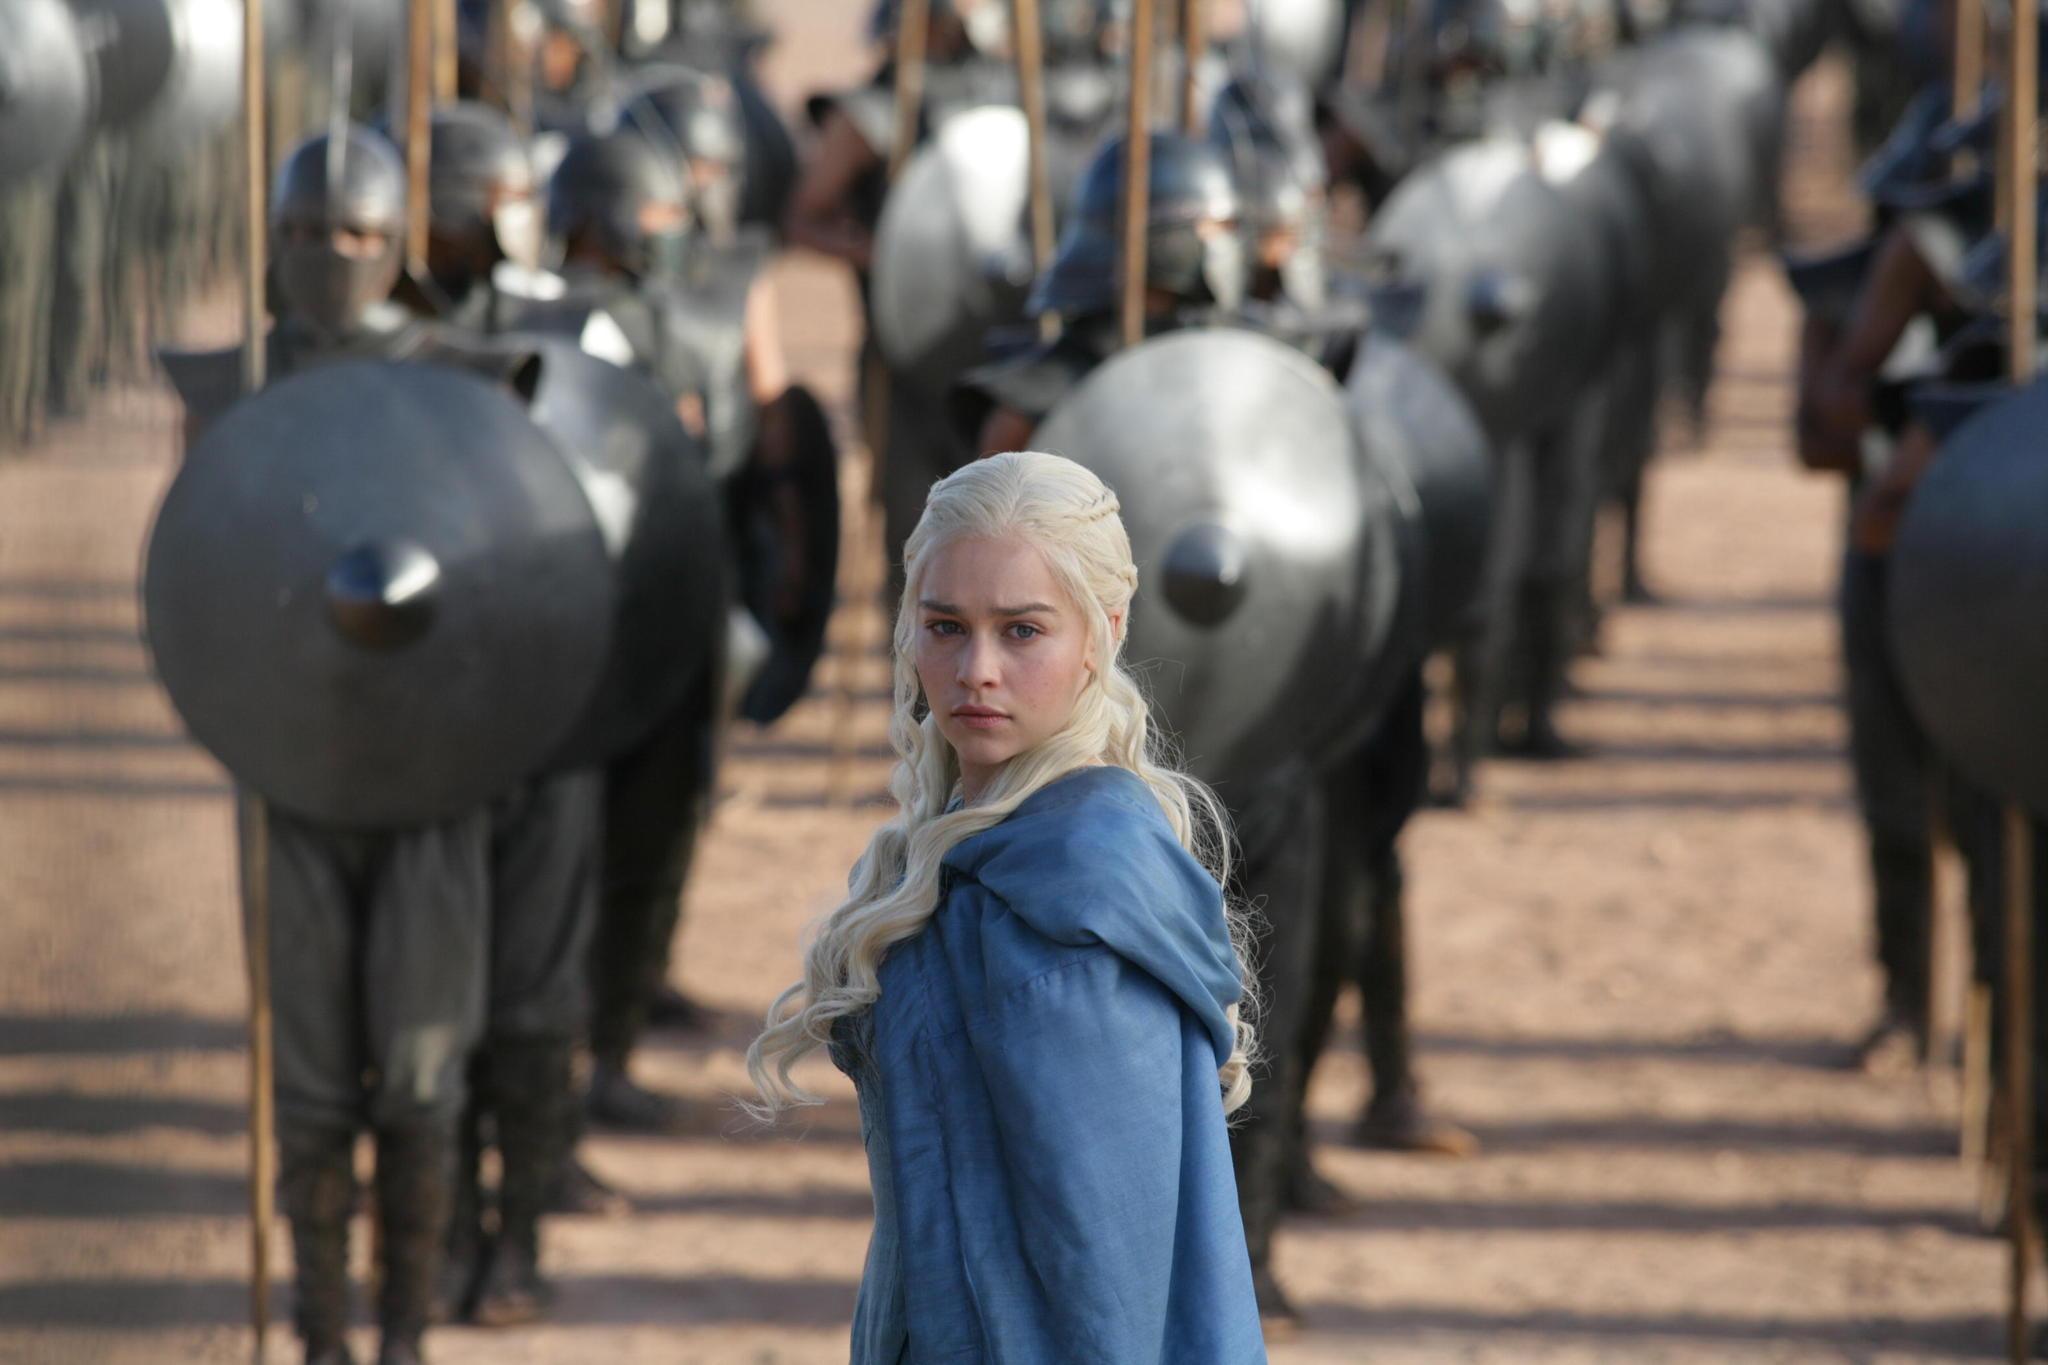 game of thrones season 3 episode 7 full download